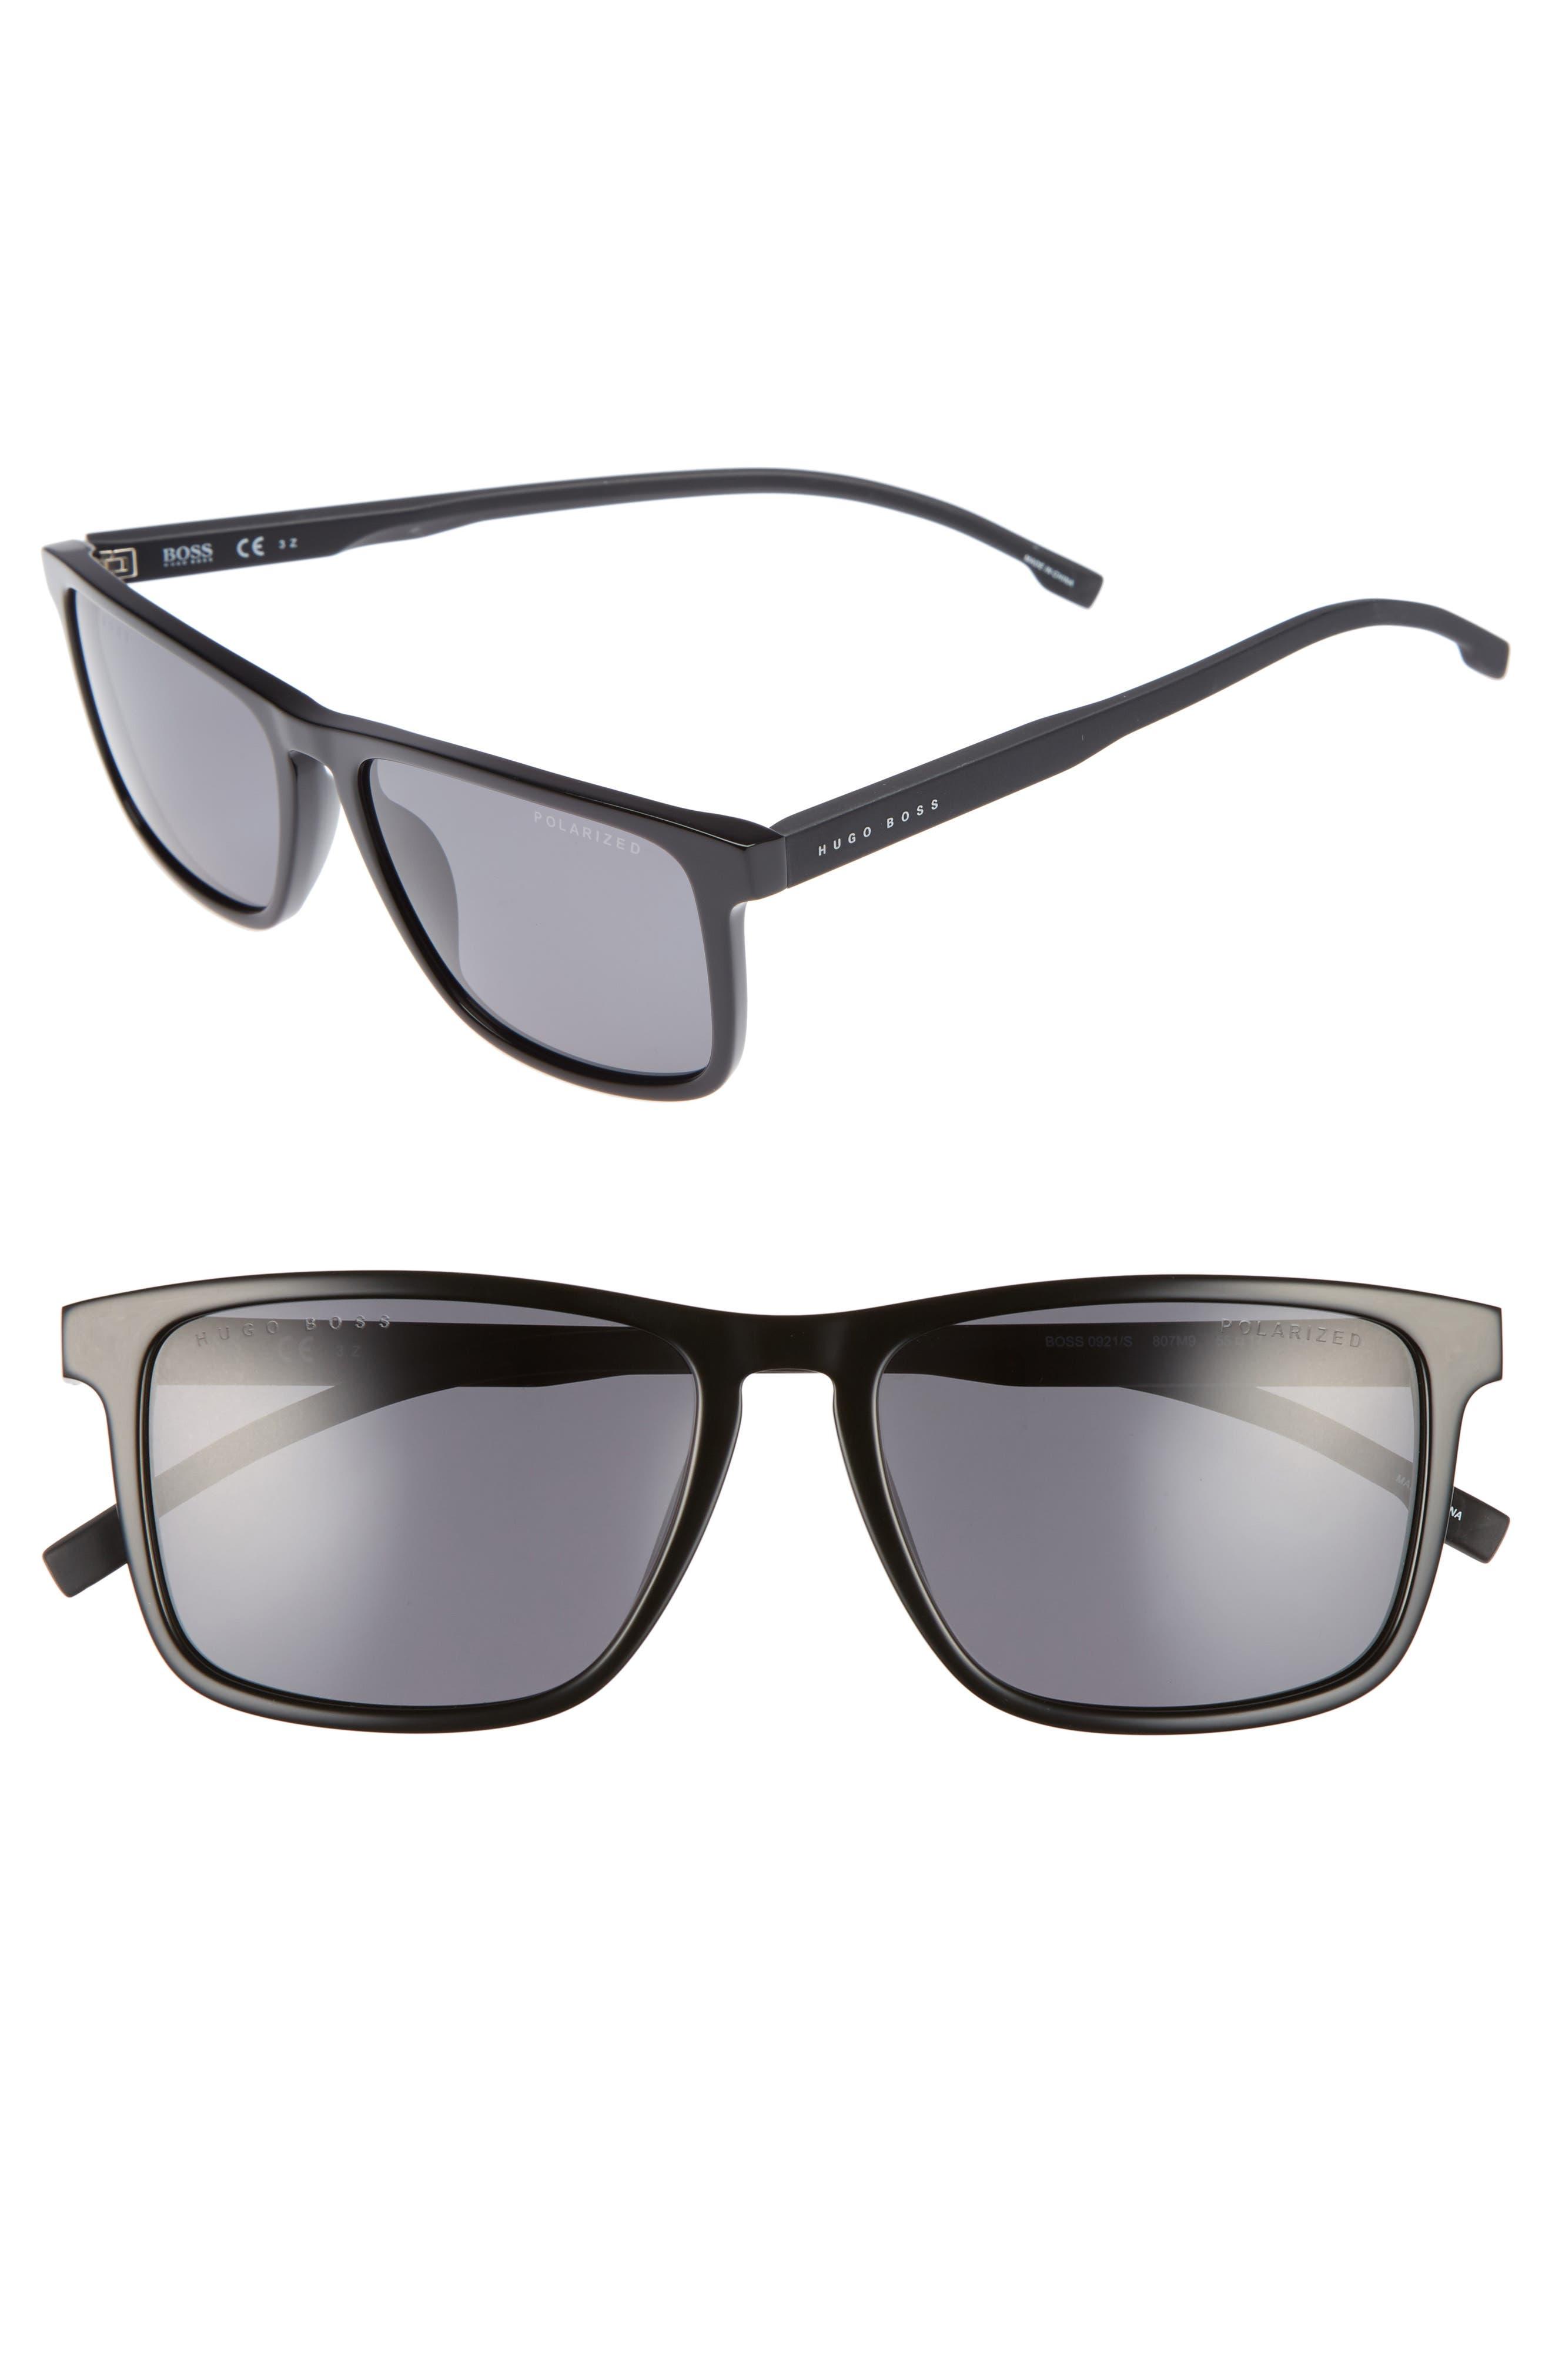 55mm Sunglasses,                         Main,                         color, Black/ Gray Polarized